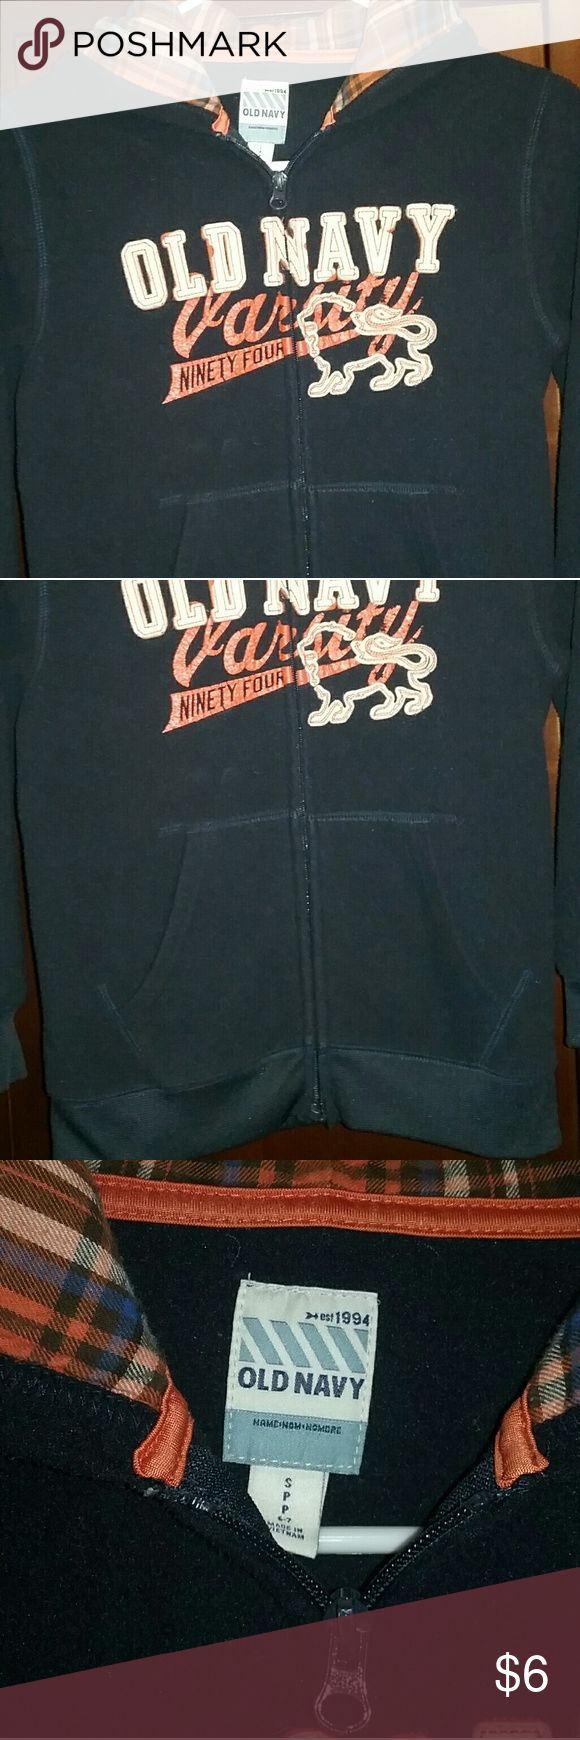 Old Navy Sweatshirt!🍕 Cute. Very nice. Old Navy Shirts & Tops Sweatshirts & Hoodies